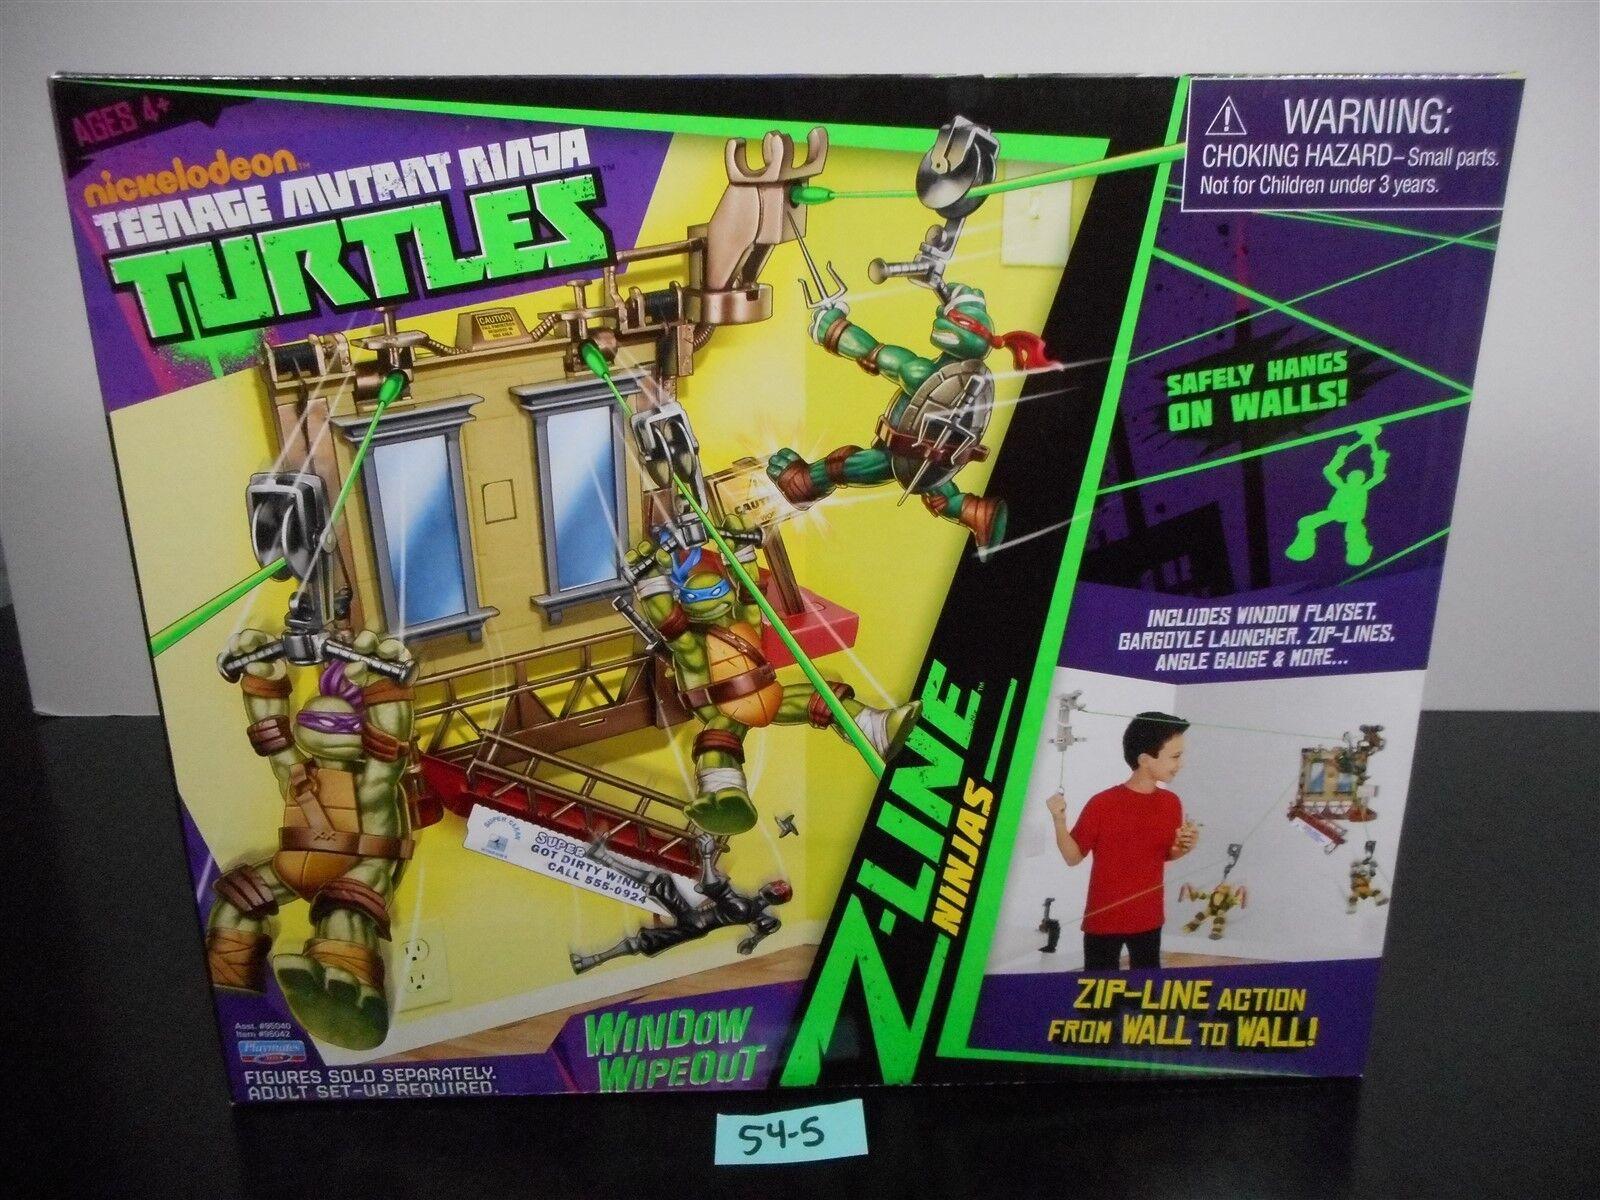 Como Nuevo Y Sellado    Teenage Mutant Ninja Turtles Nickelodeon Ventana Wipeout Zip-line Tortugas Ninja 54-5